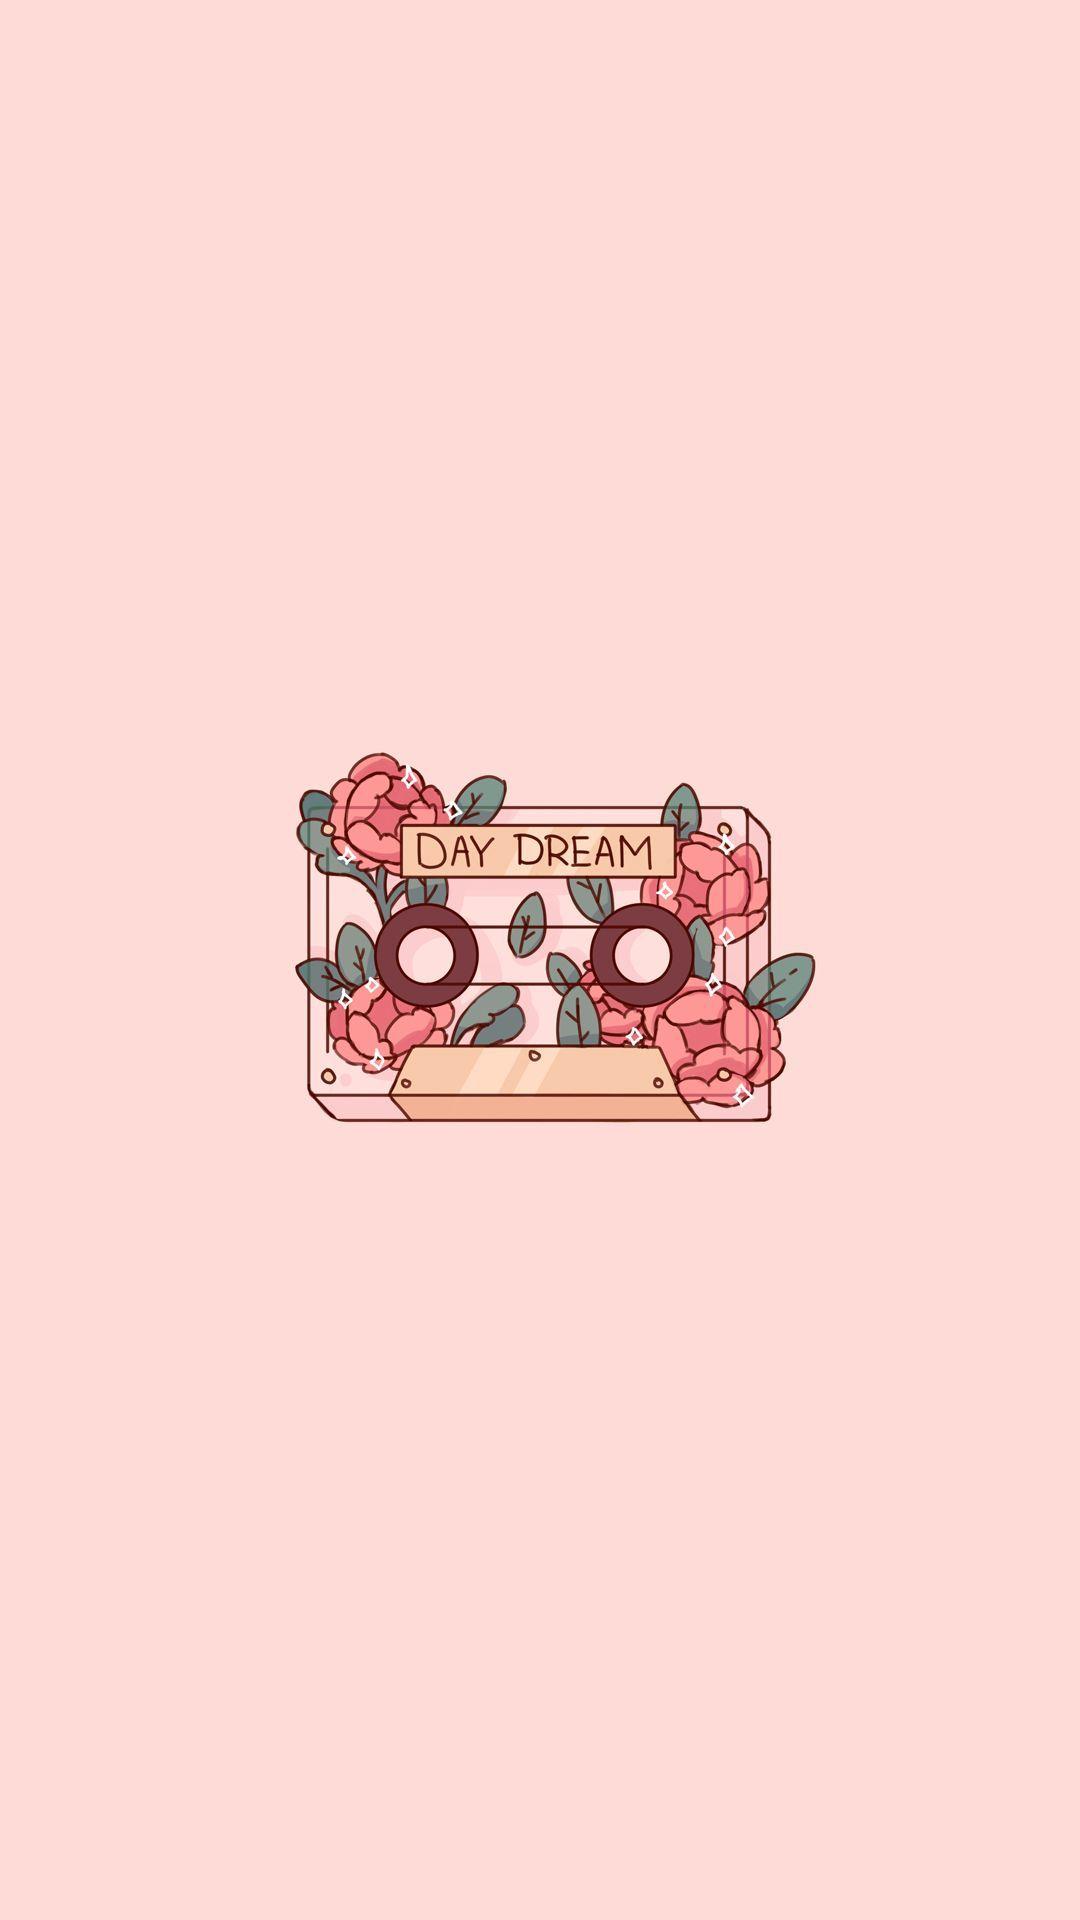 Flower Cassette Tape Sticker Flake Cute Aesthetic Plant